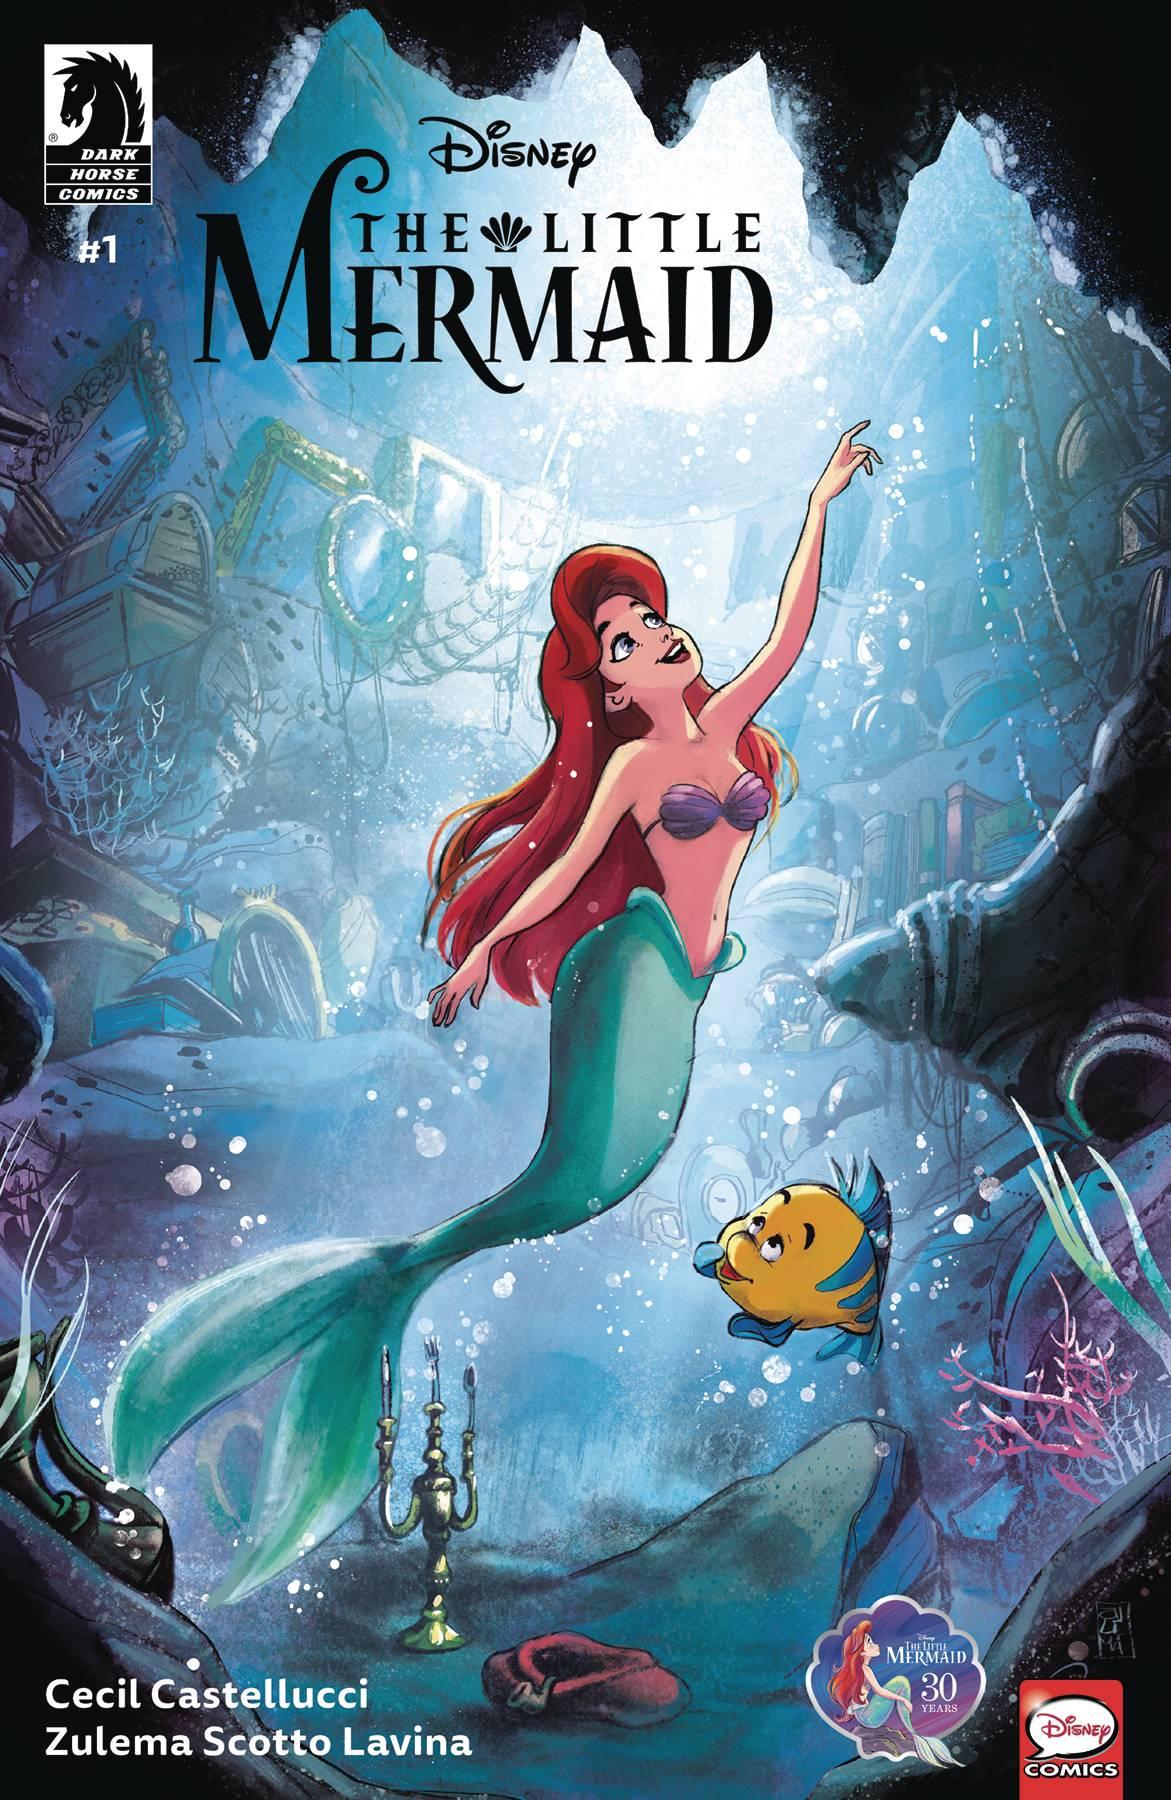 Disney The Little Mermaid #1 (2019)